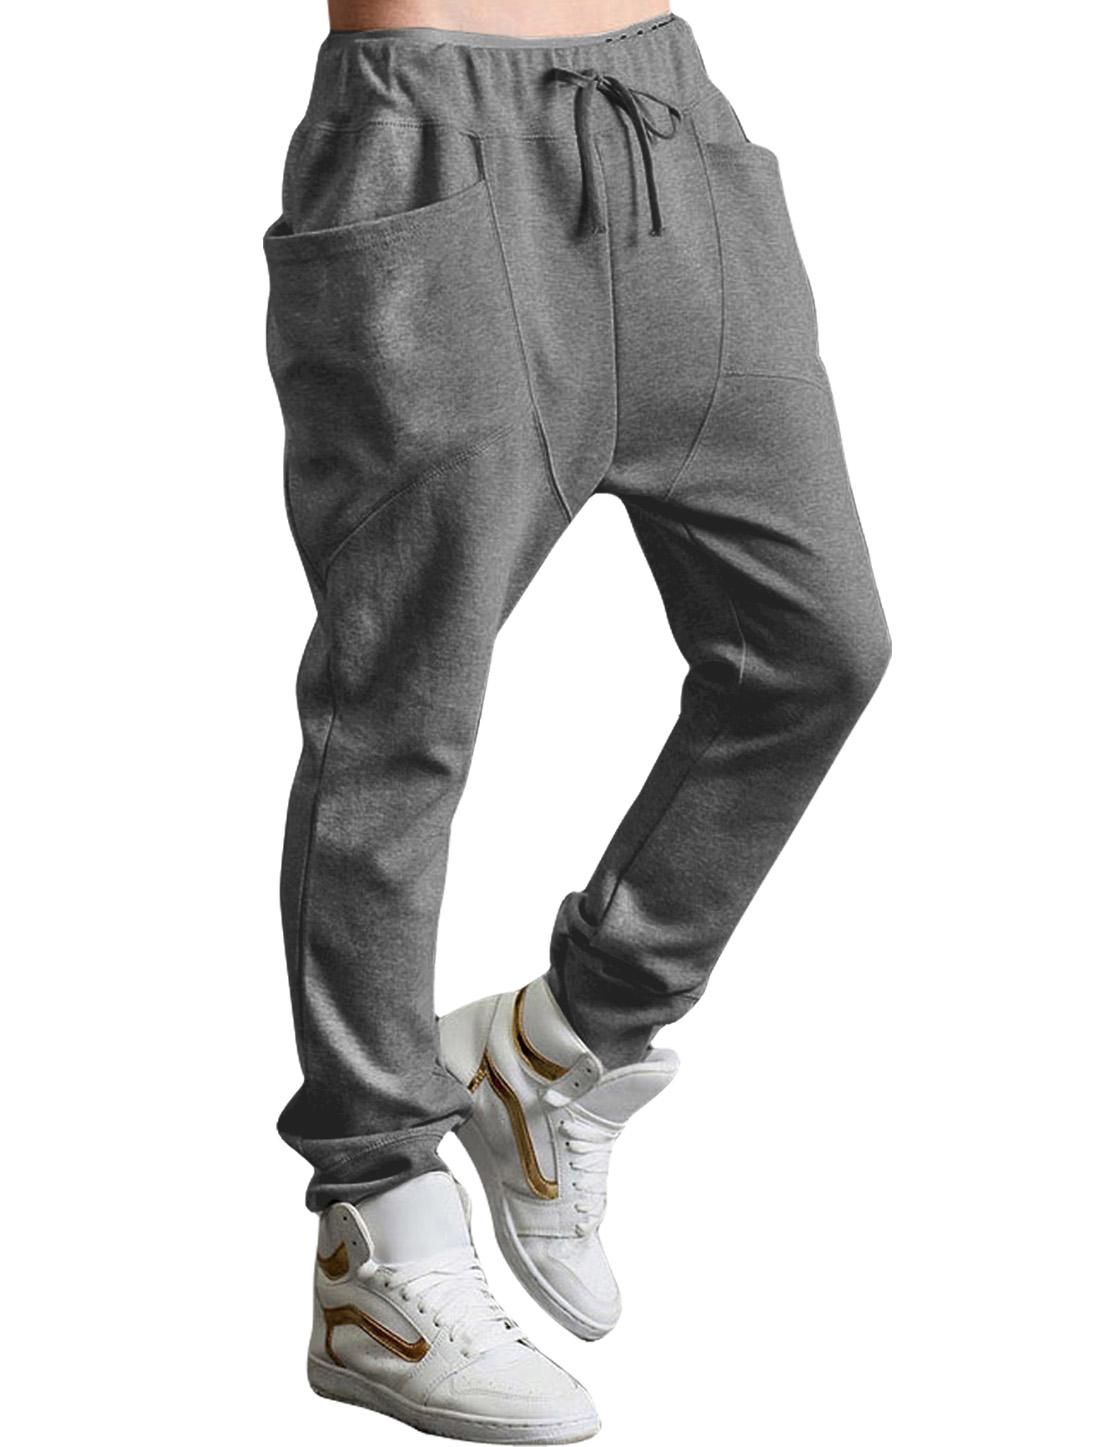 Men's Funnel Pockets Drop Crotch Drawstring Sweatpants